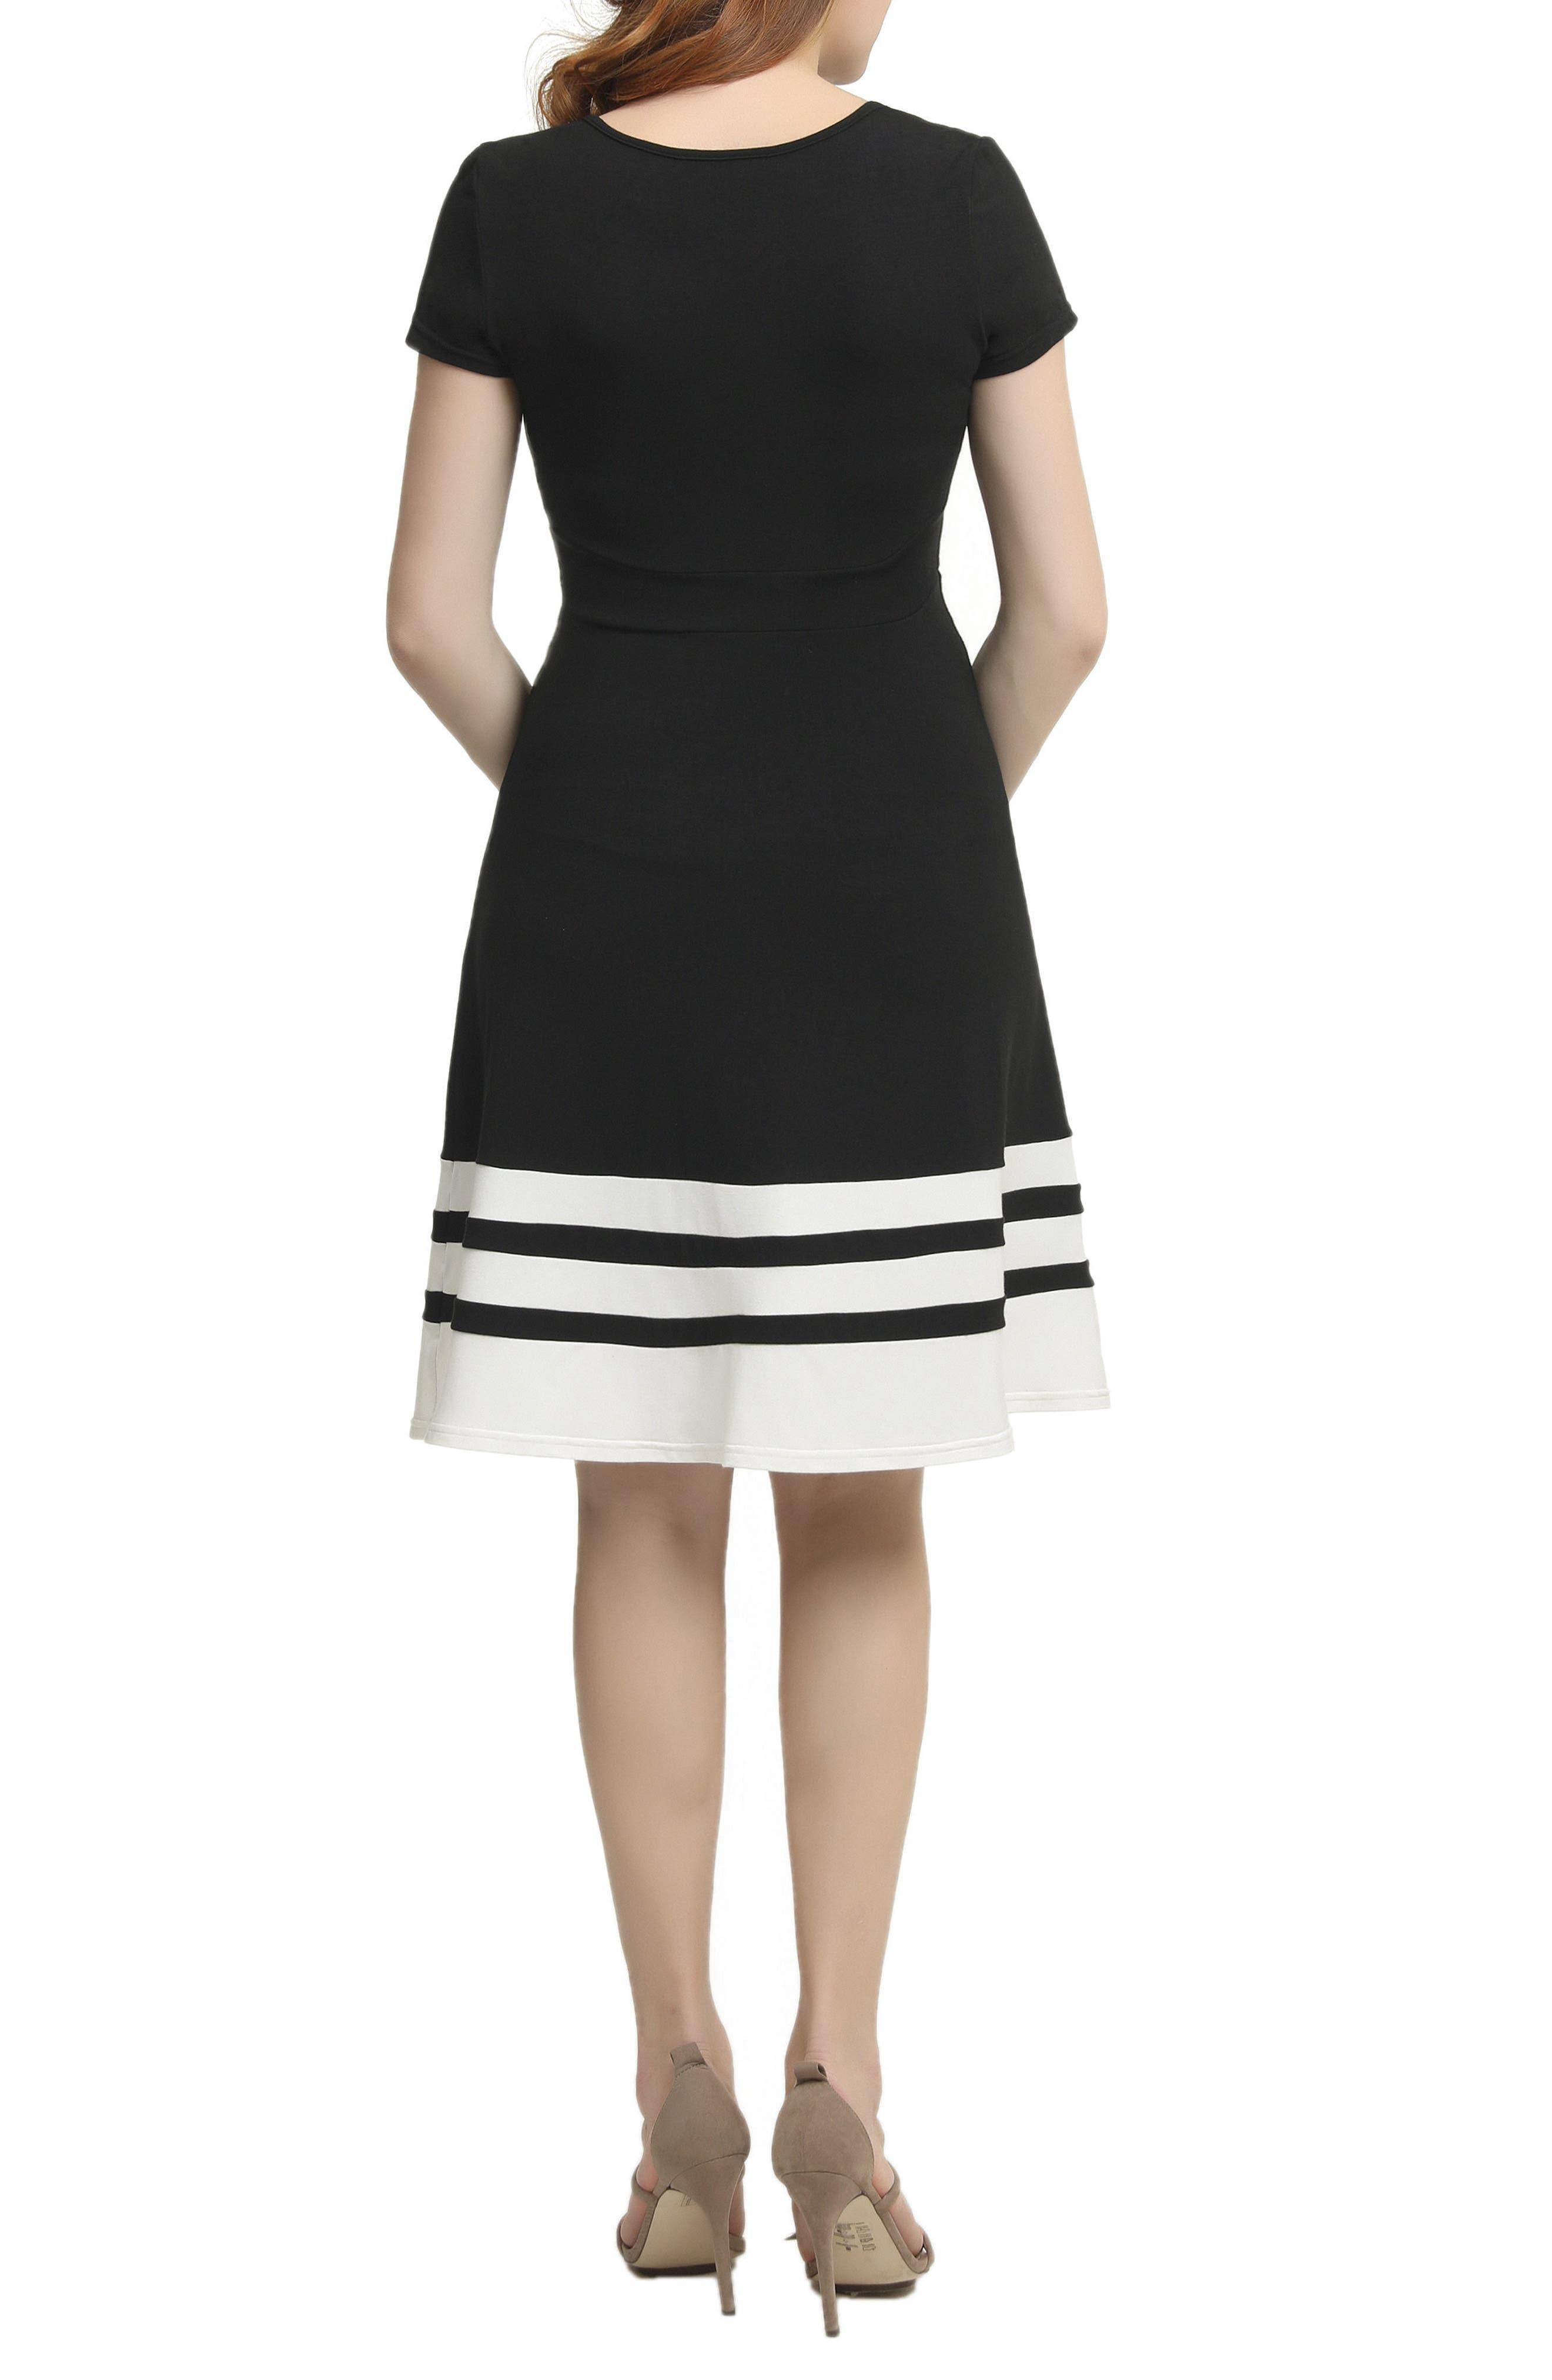 Theresa Colorblock Maternity Skater Dress,                             Alternate thumbnail 2, color,                             BLACK/ WHITE